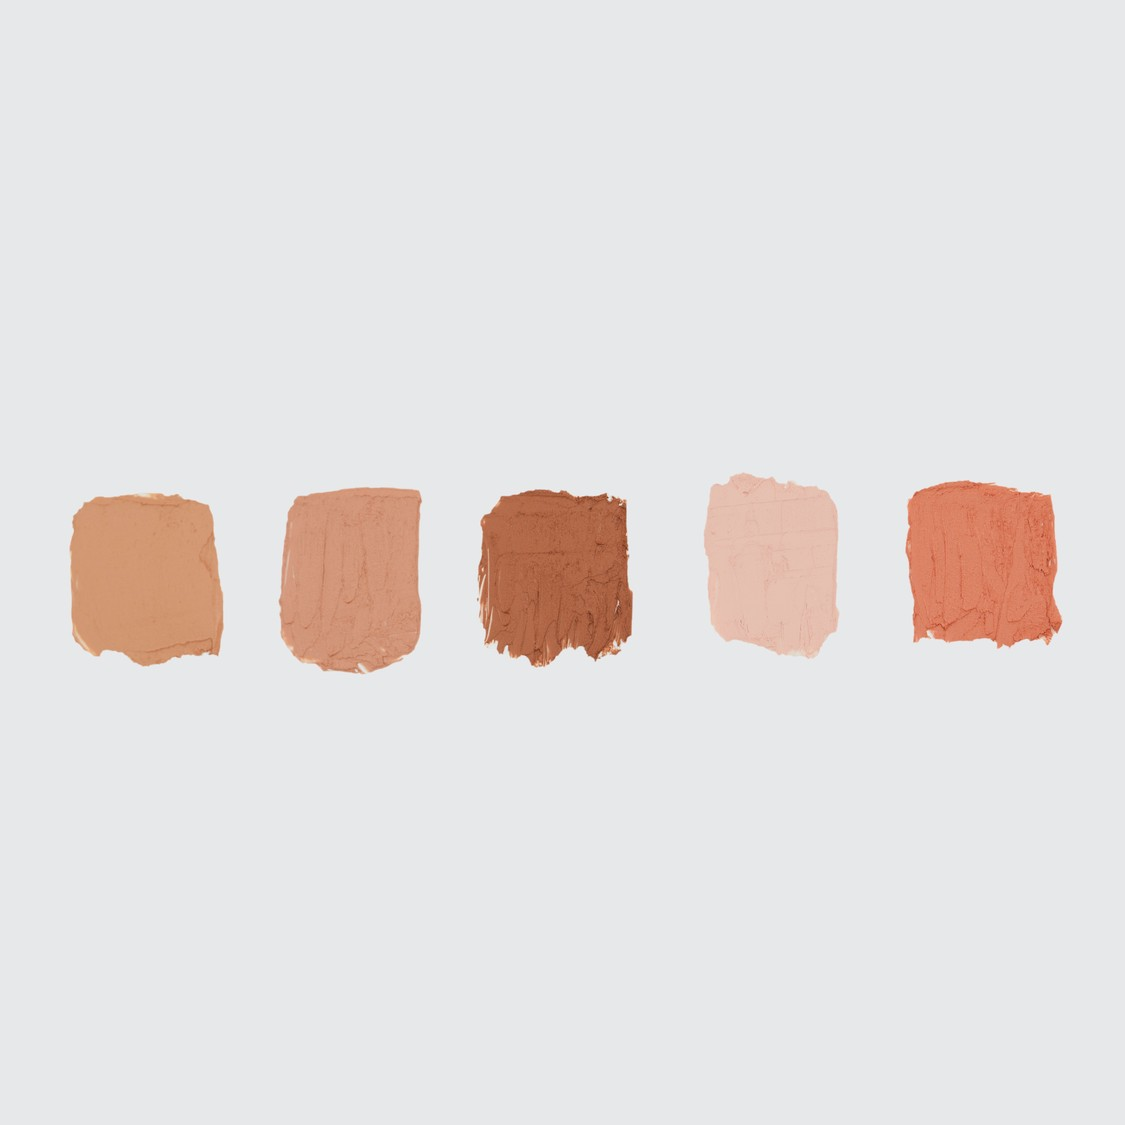 IKSU Conceal and Contour Palette